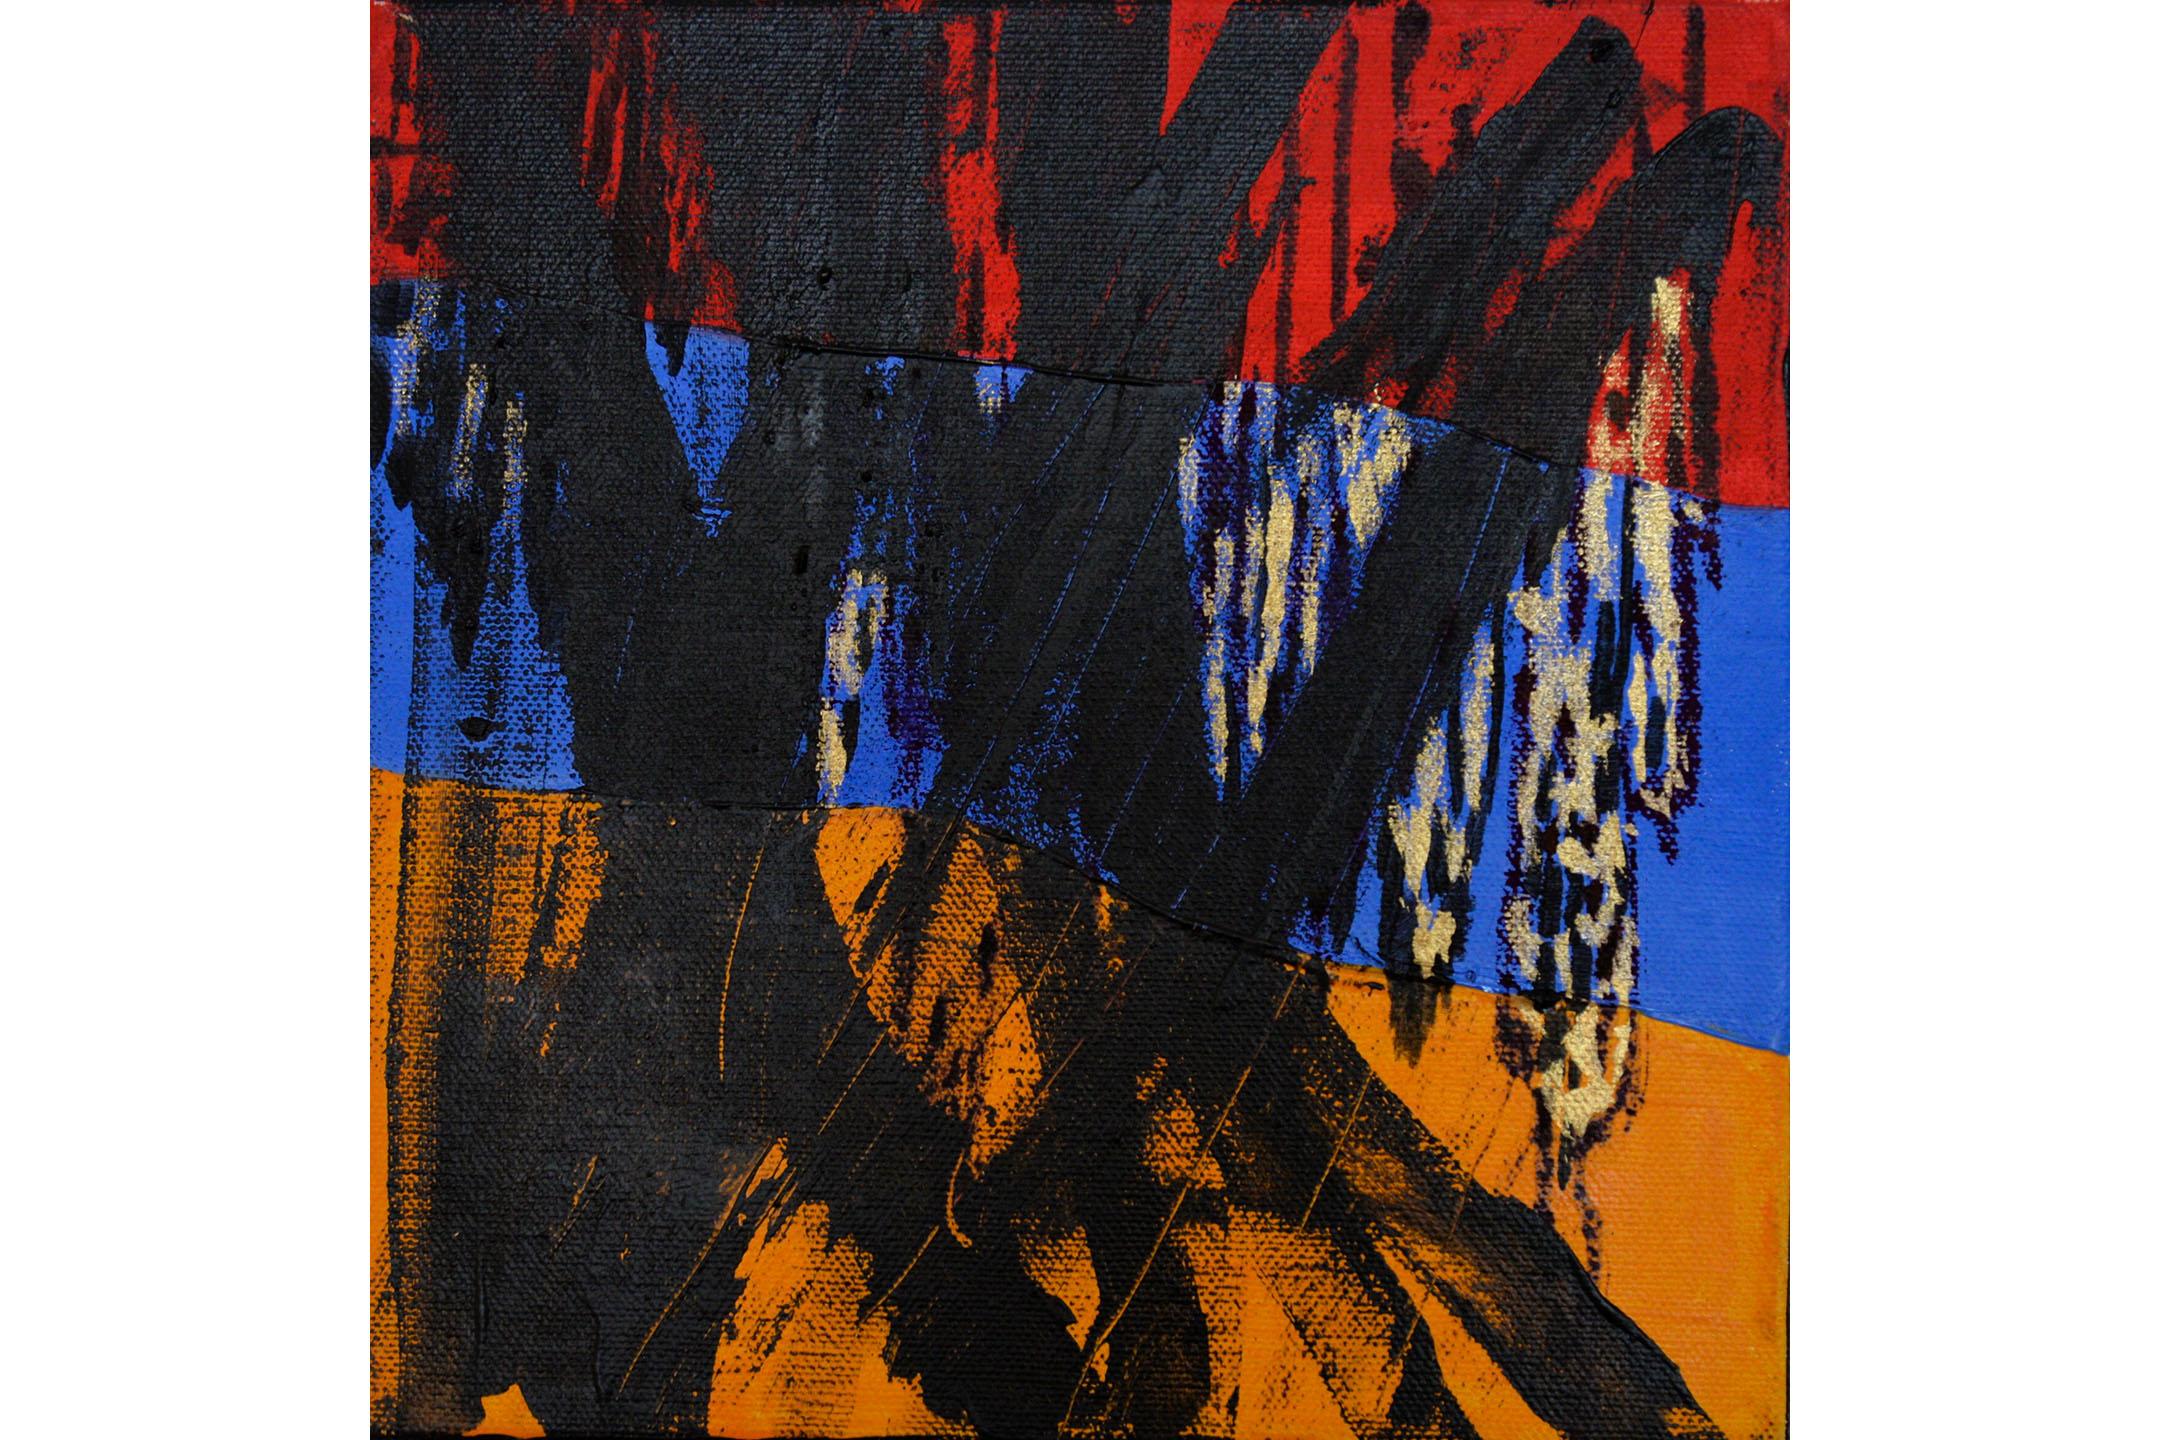 "Azita Ghafouri, Basics of Jane Jacobs 1, Mixed media on canvas, 8"" x 8"", 2016"